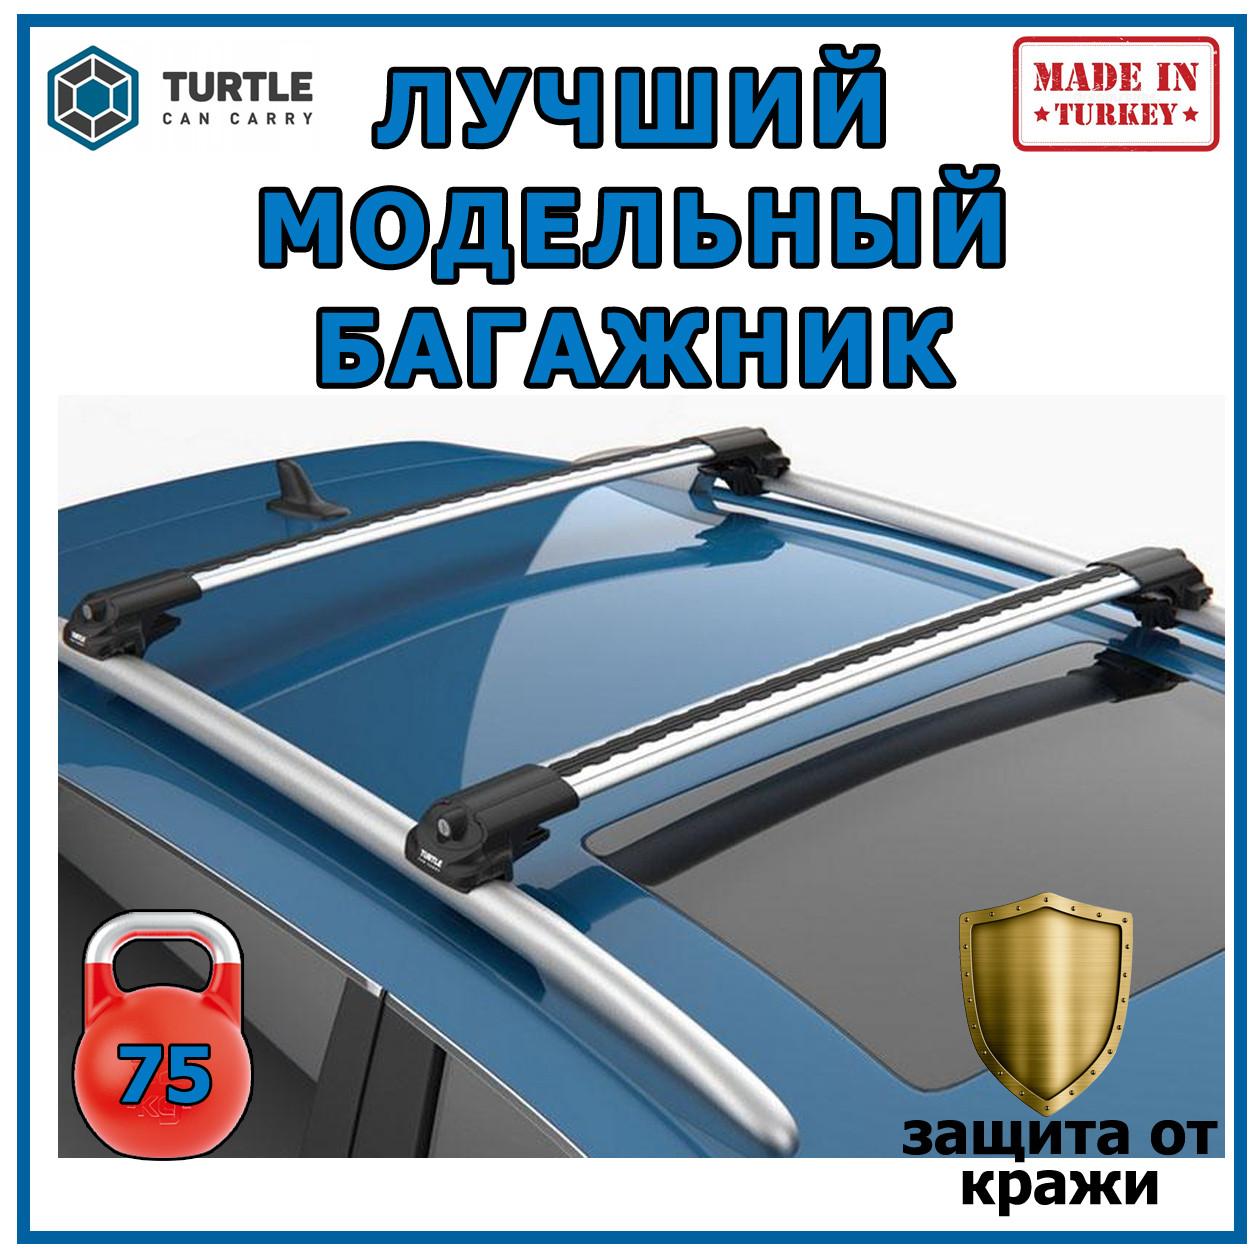 Багажник на крышу Mercedes GLK-Class 2009-2015 на рейлинги серый Turtle